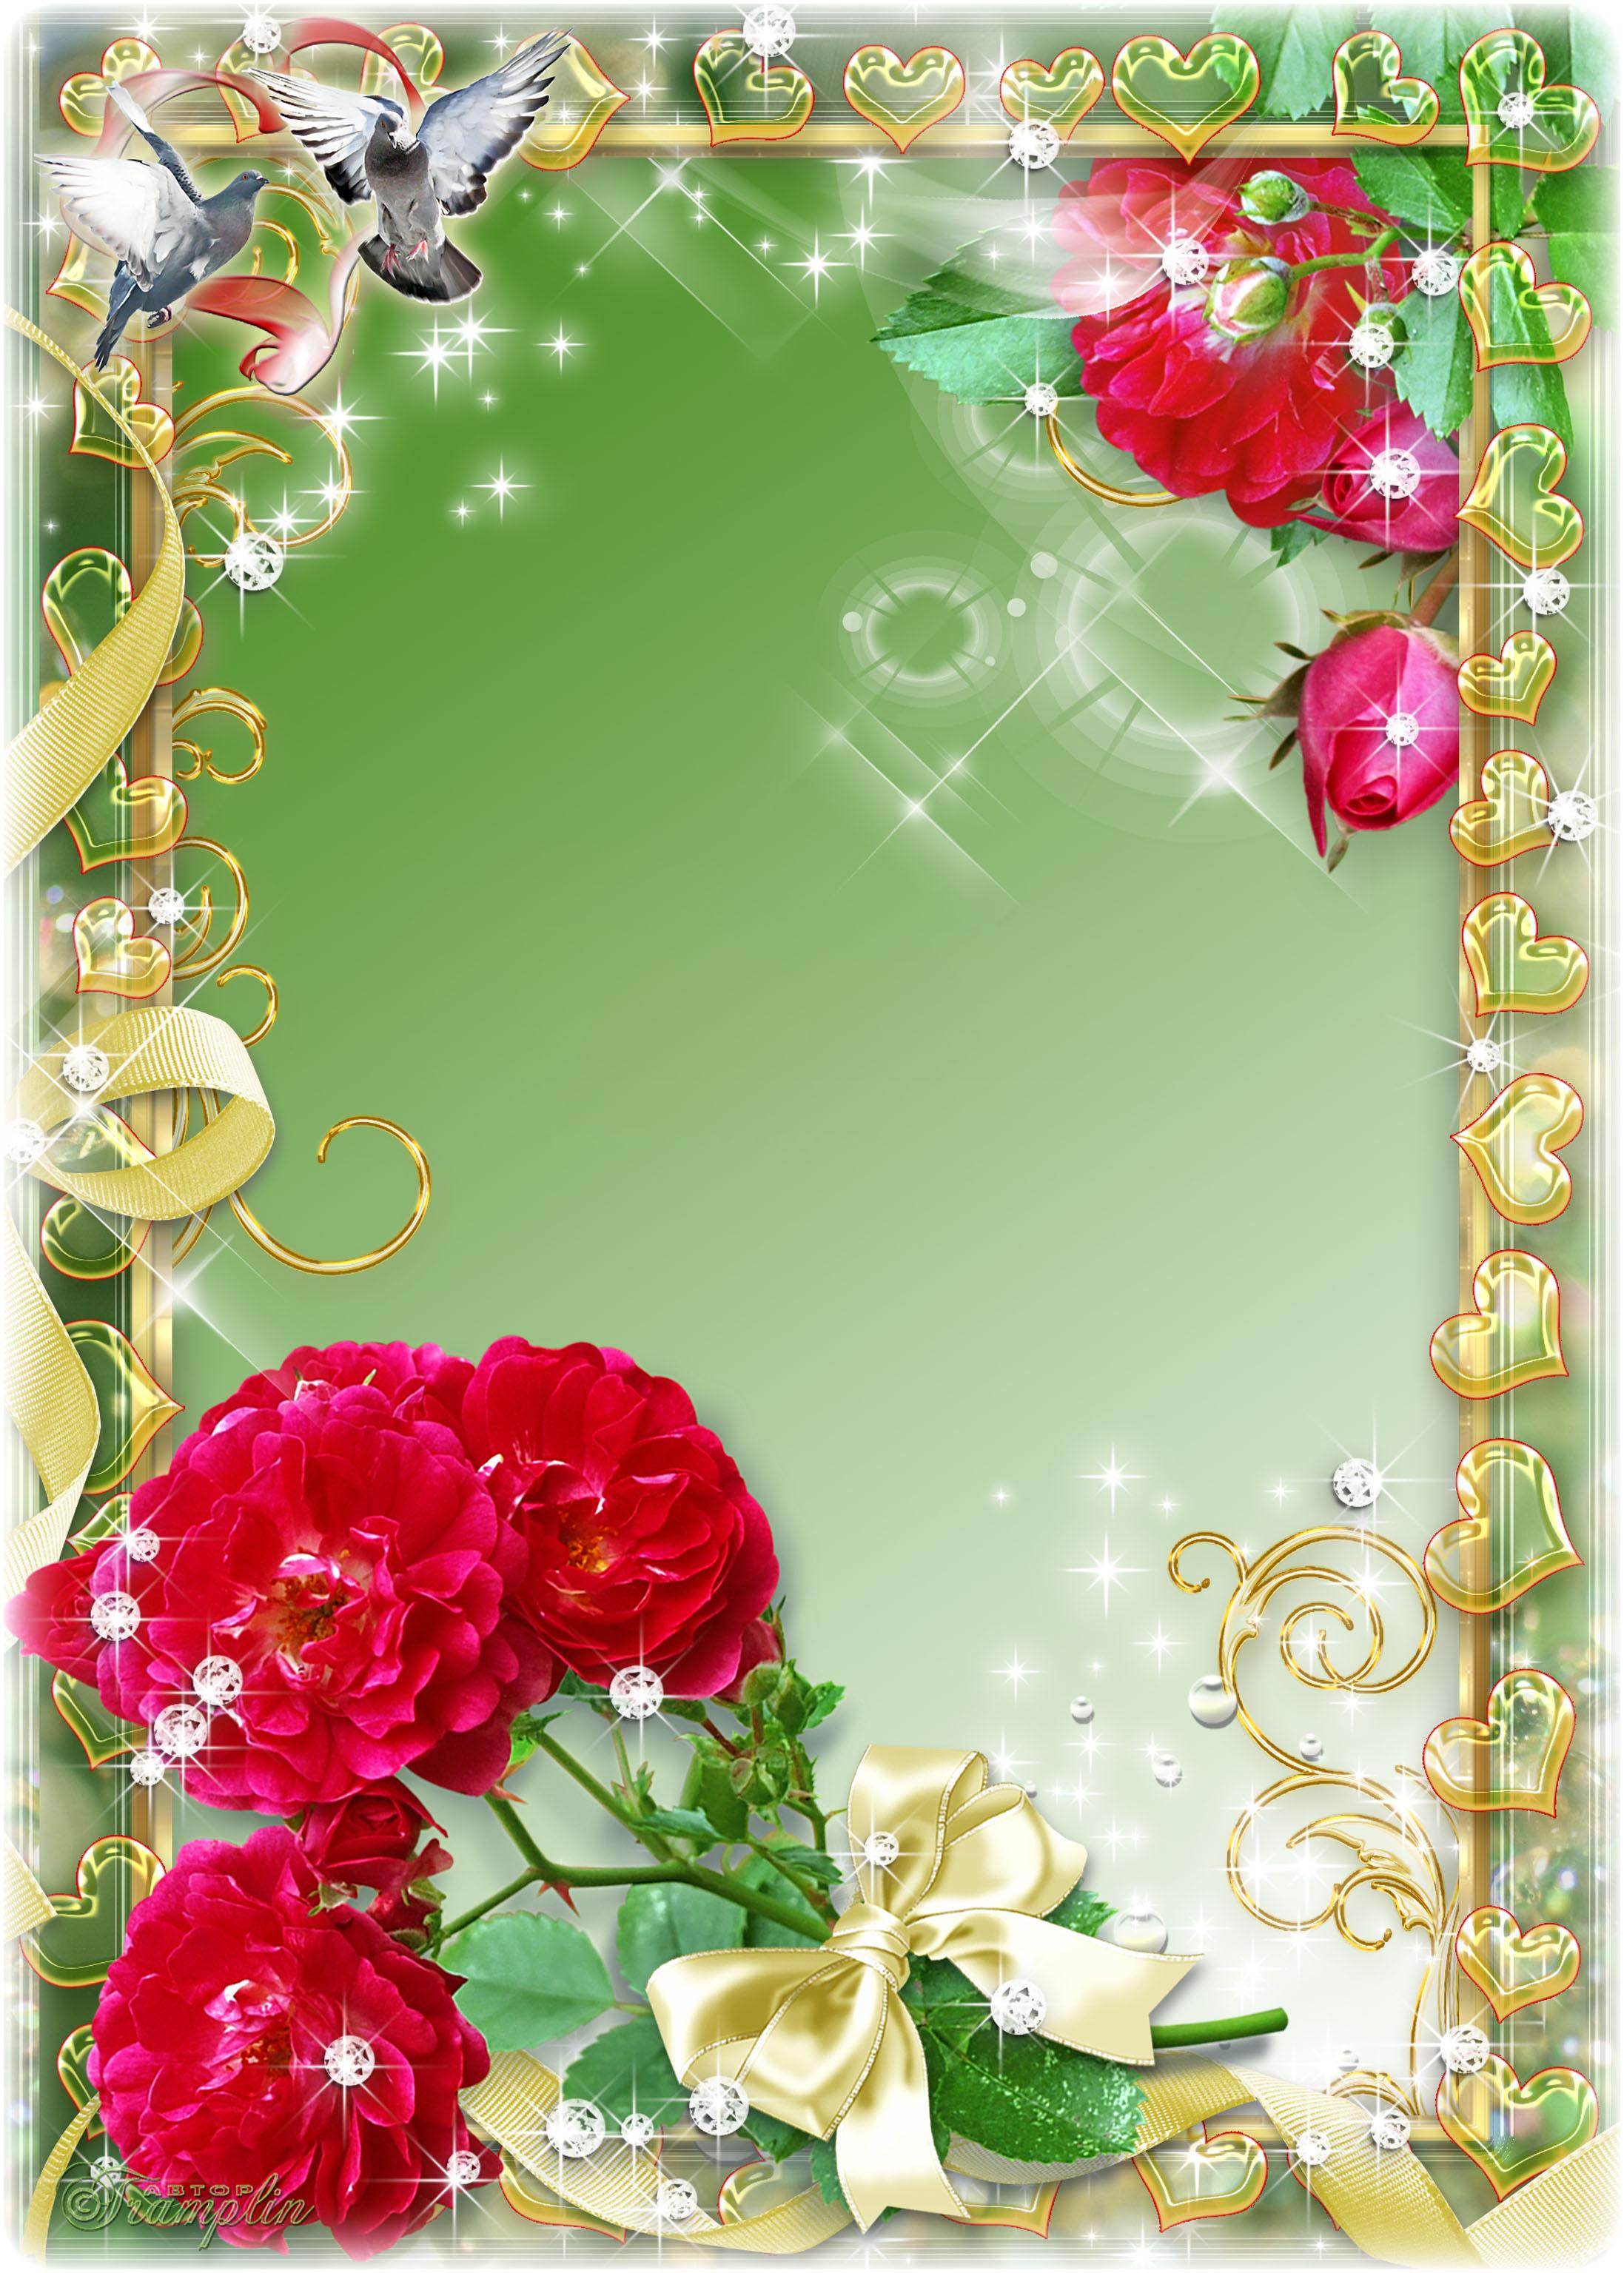 http://img-fotki.yandex.ru/get/5642/41771327.34e/0_86e2c_35329872_orig.jpg